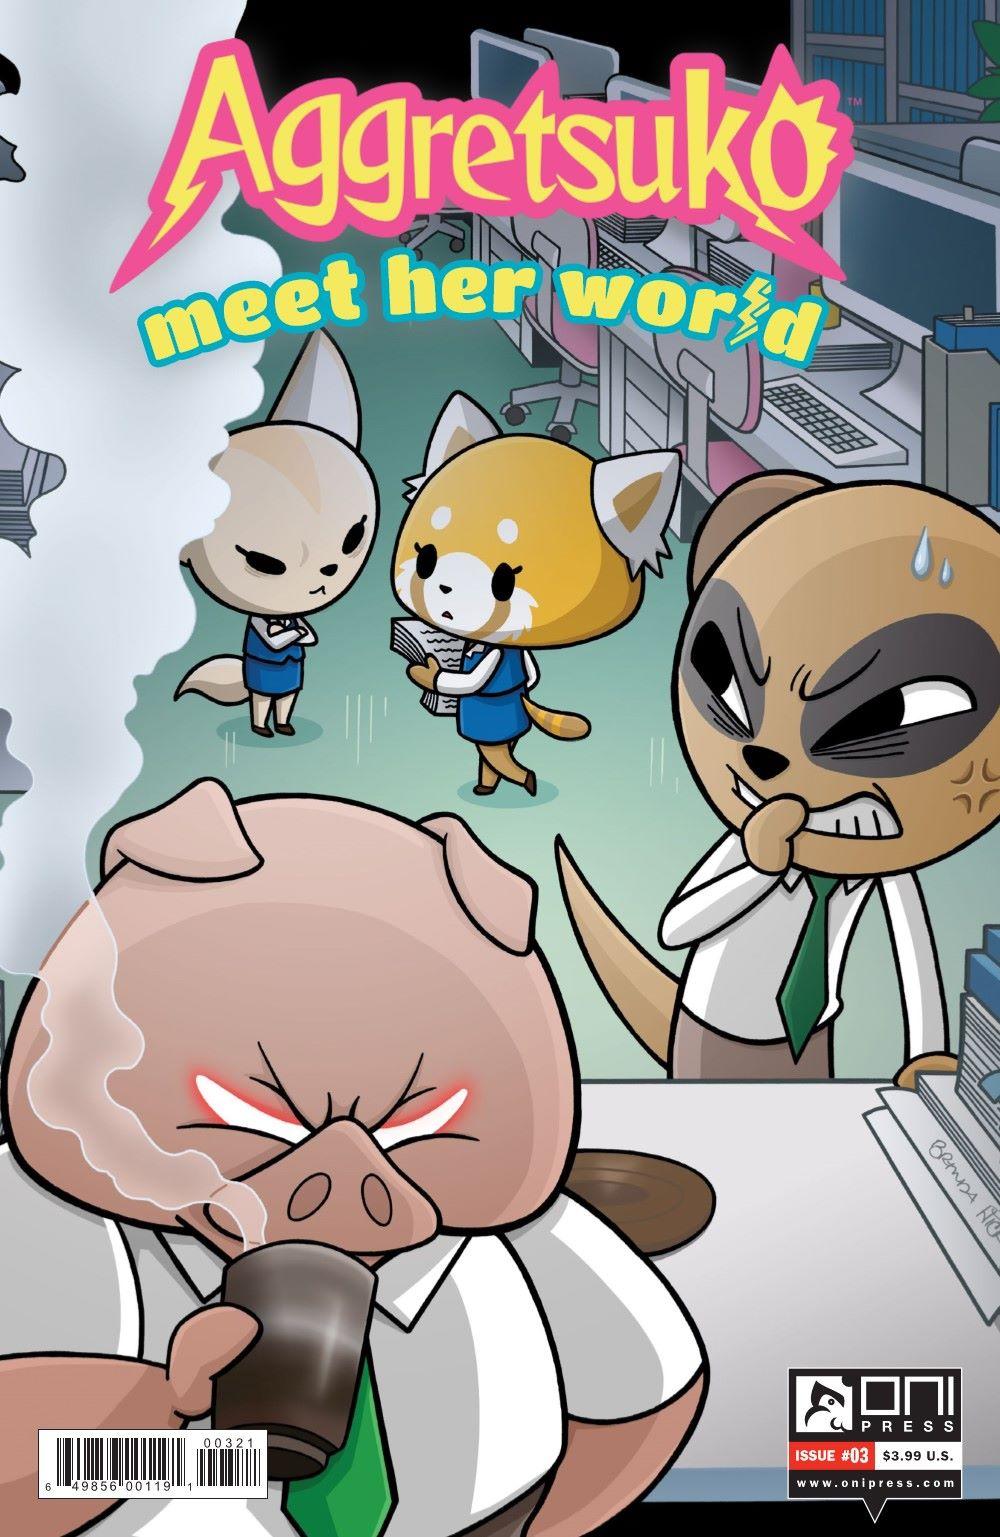 AGGRETSUKO-MHW-3-MARKETING-02 ComicList Previews: AGGRETSUKO MEET HER WORLD #3